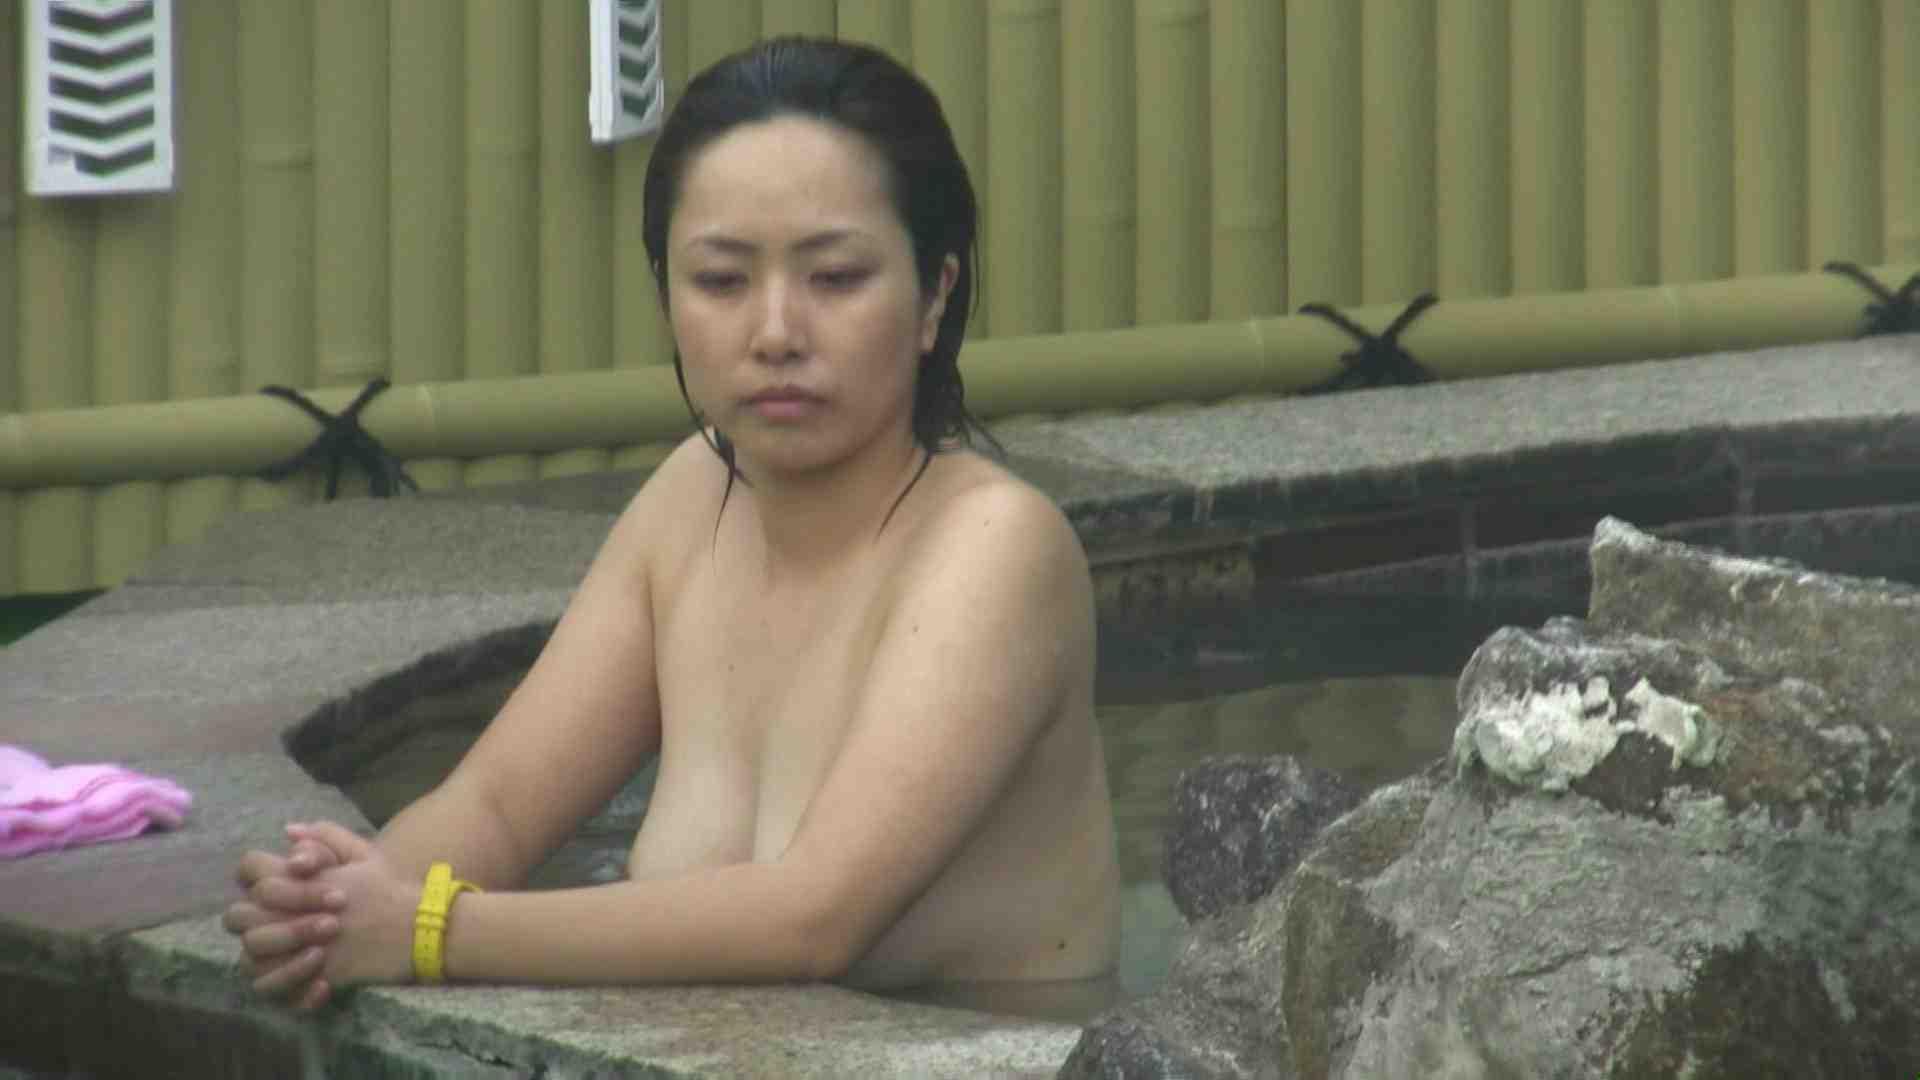 Aquaな露天風呂Vol.604 綺麗なOLたち  111枚 30